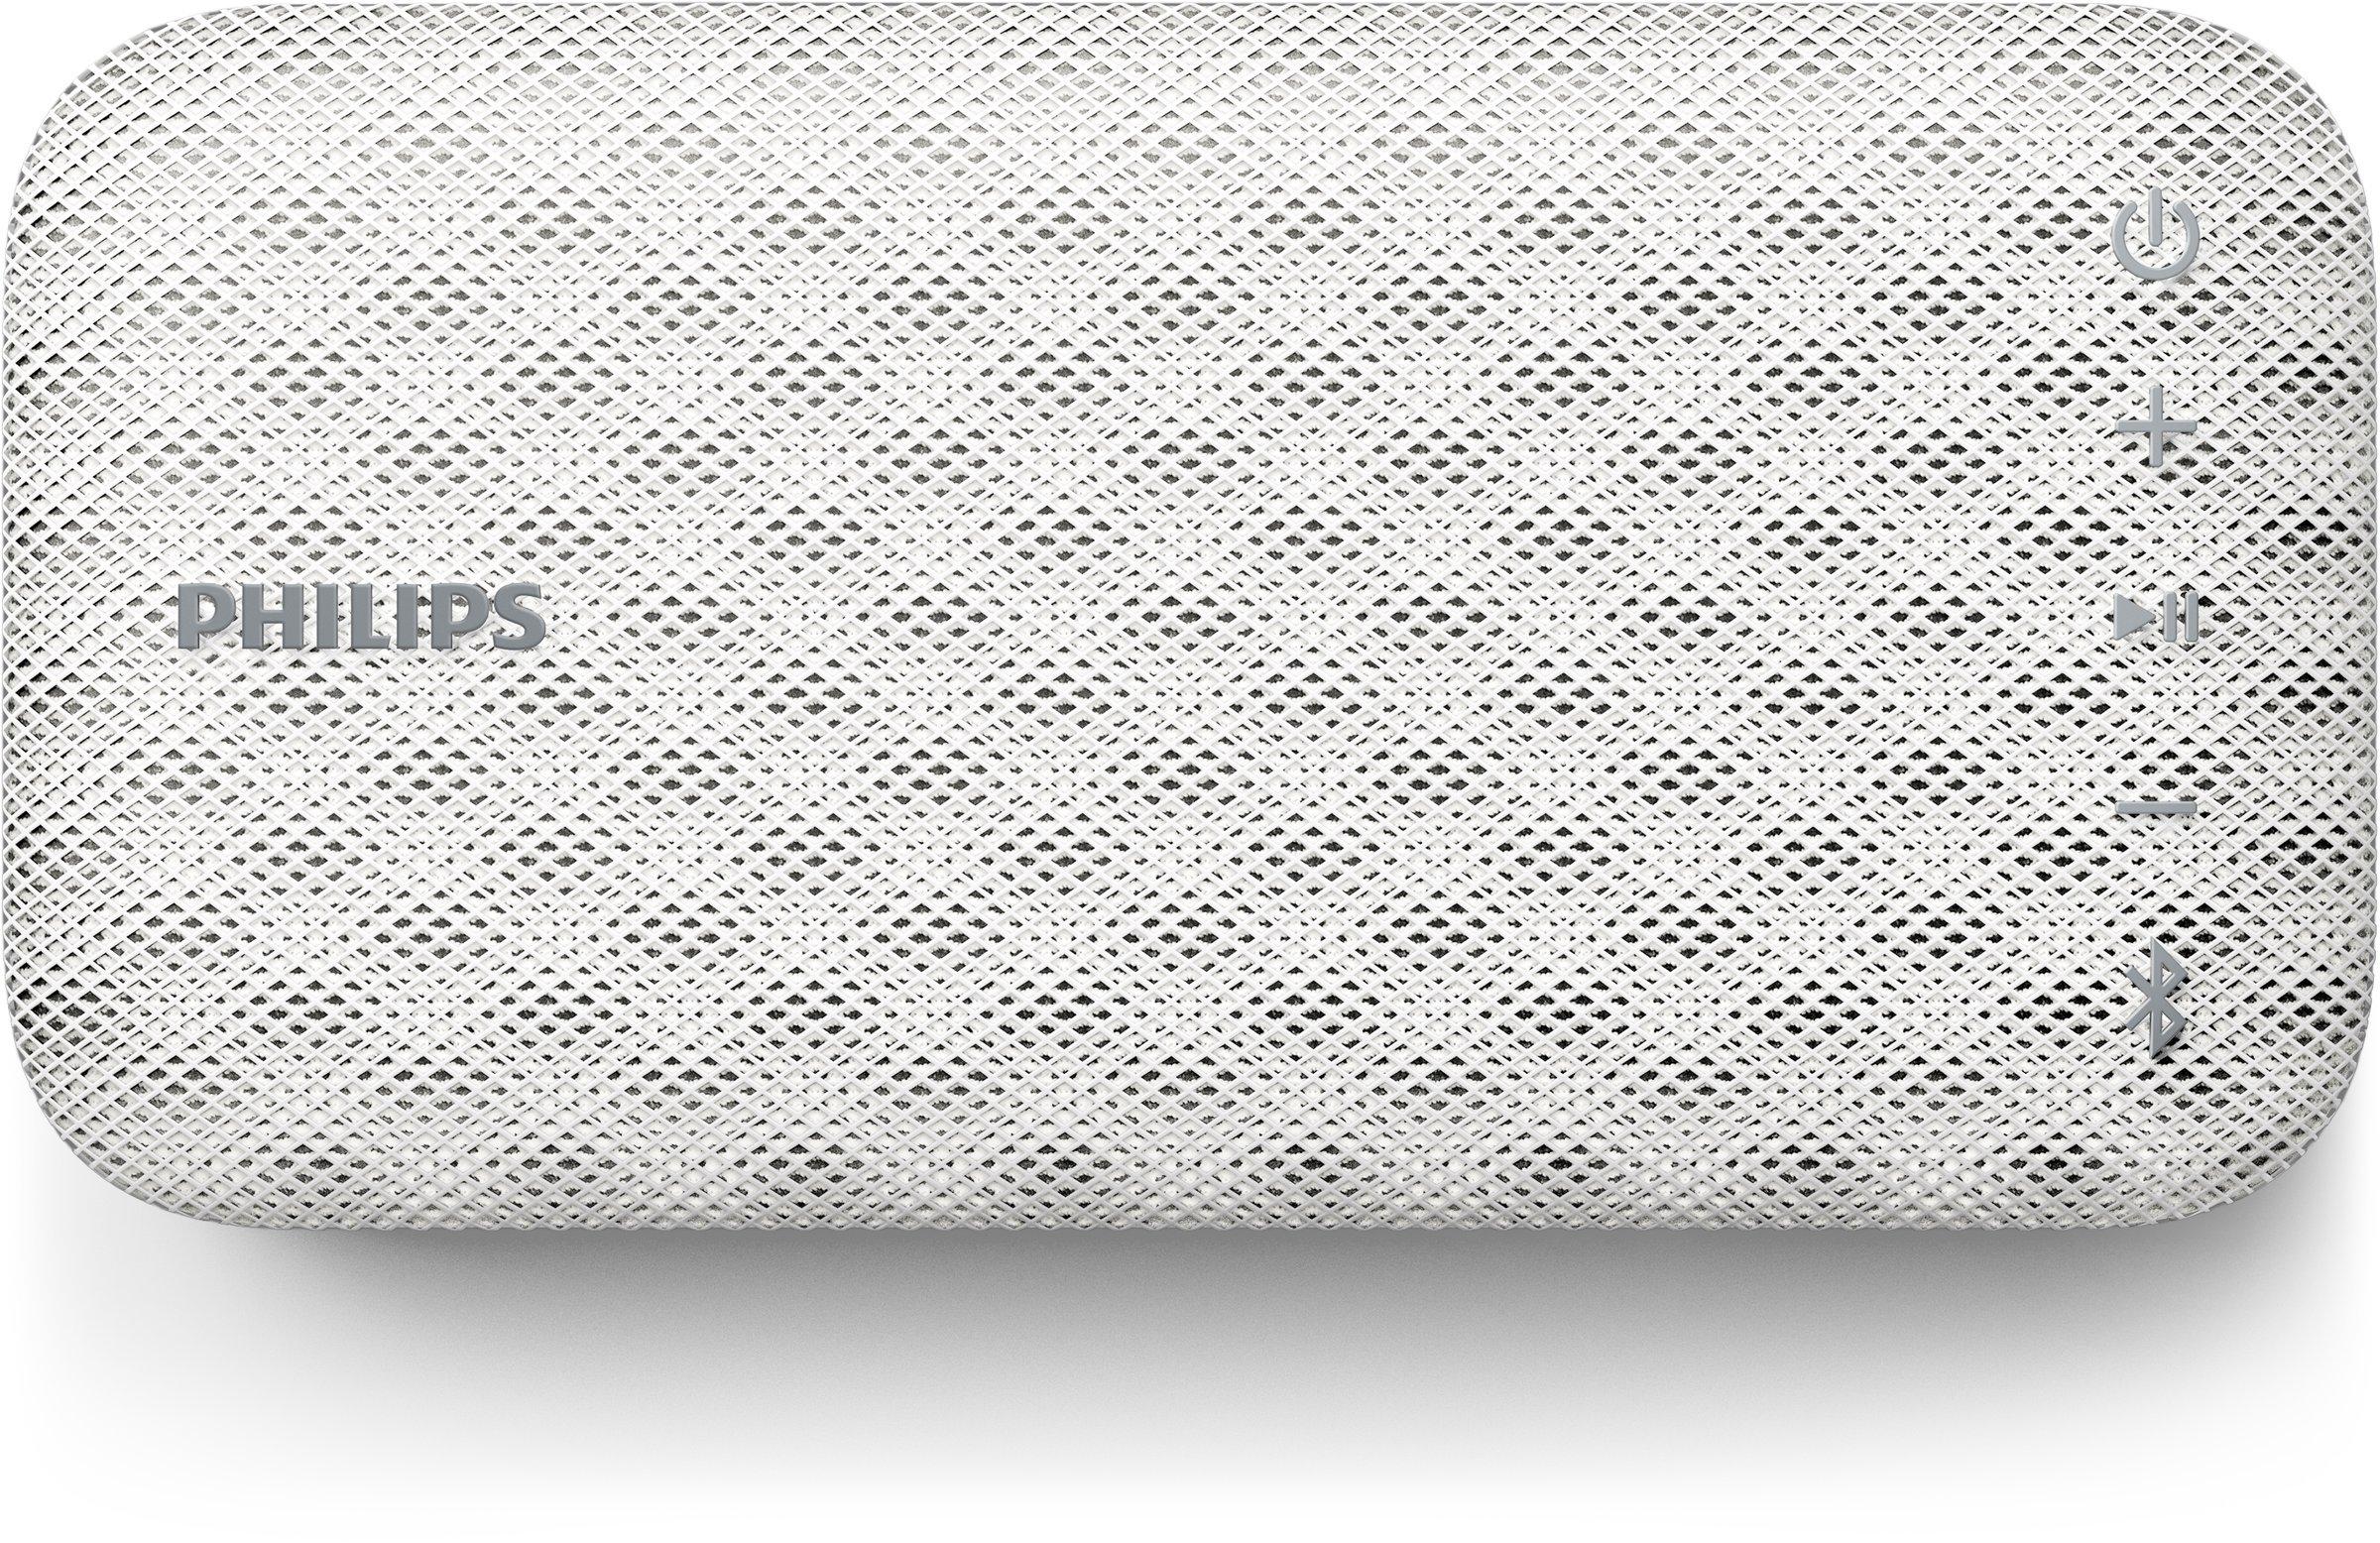 Philips BT3900W 37 Wireless Speaker